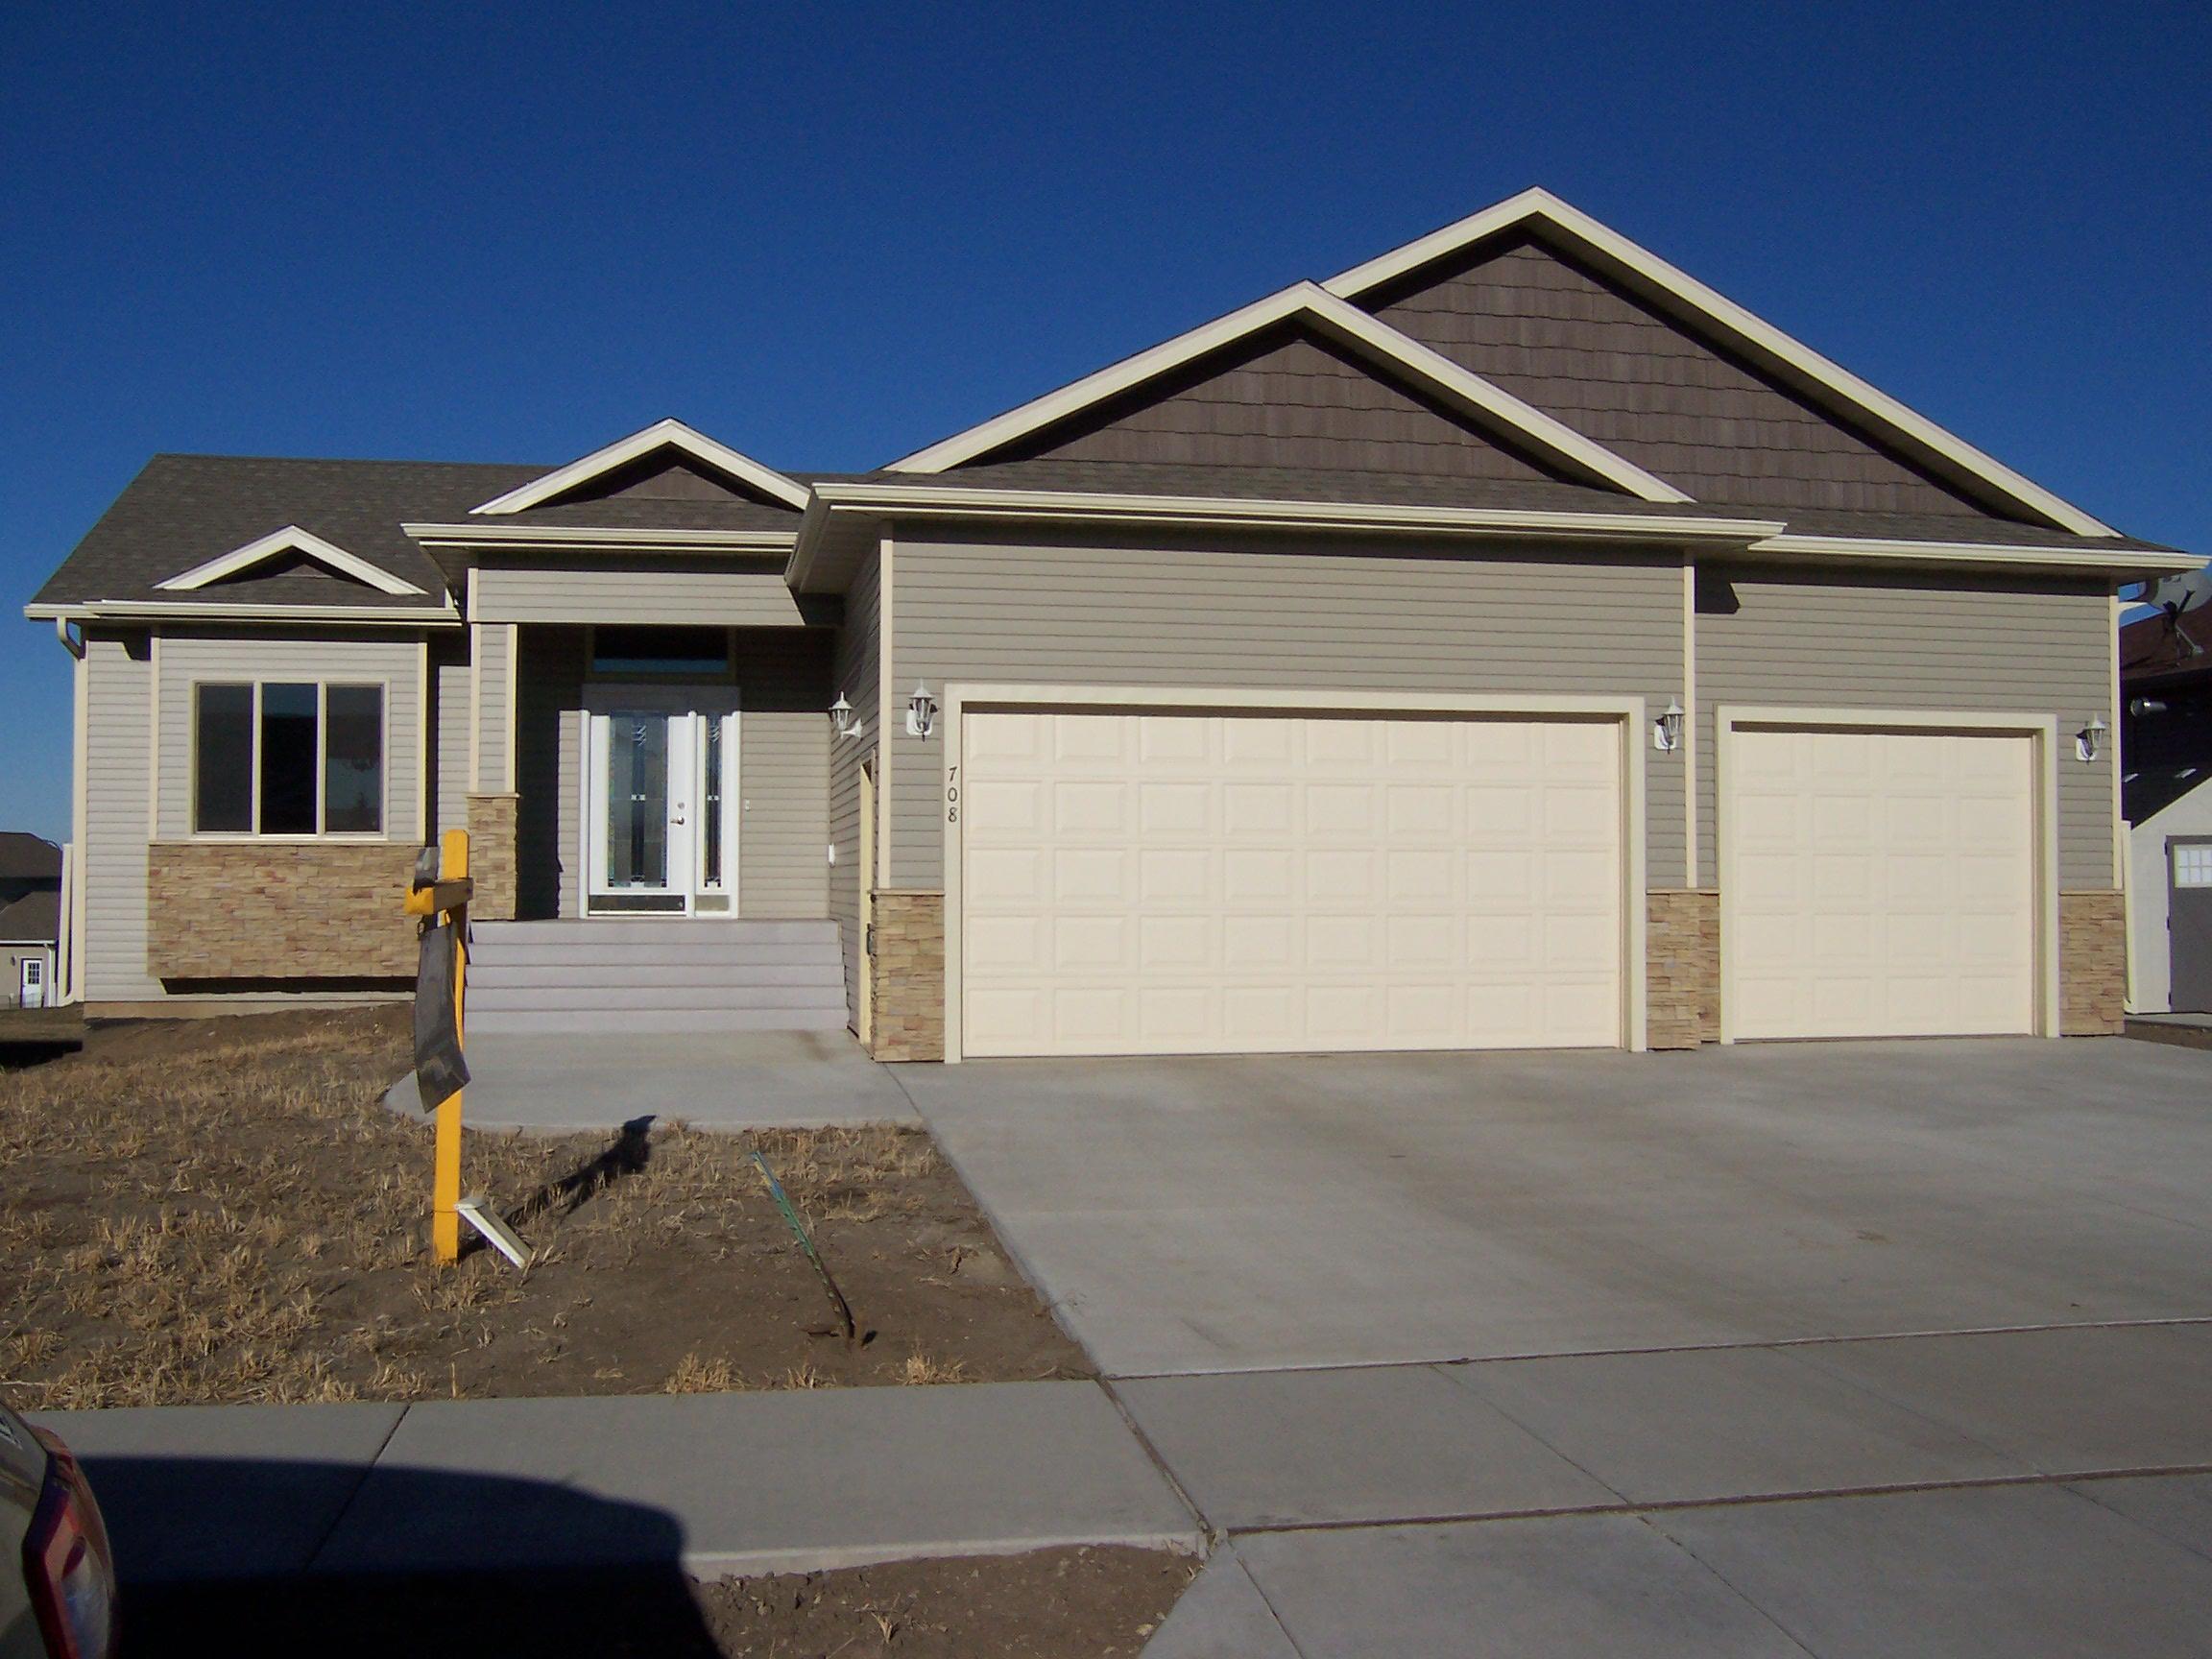 708 Farmstead Ct, Mandan, North Dakota 58554